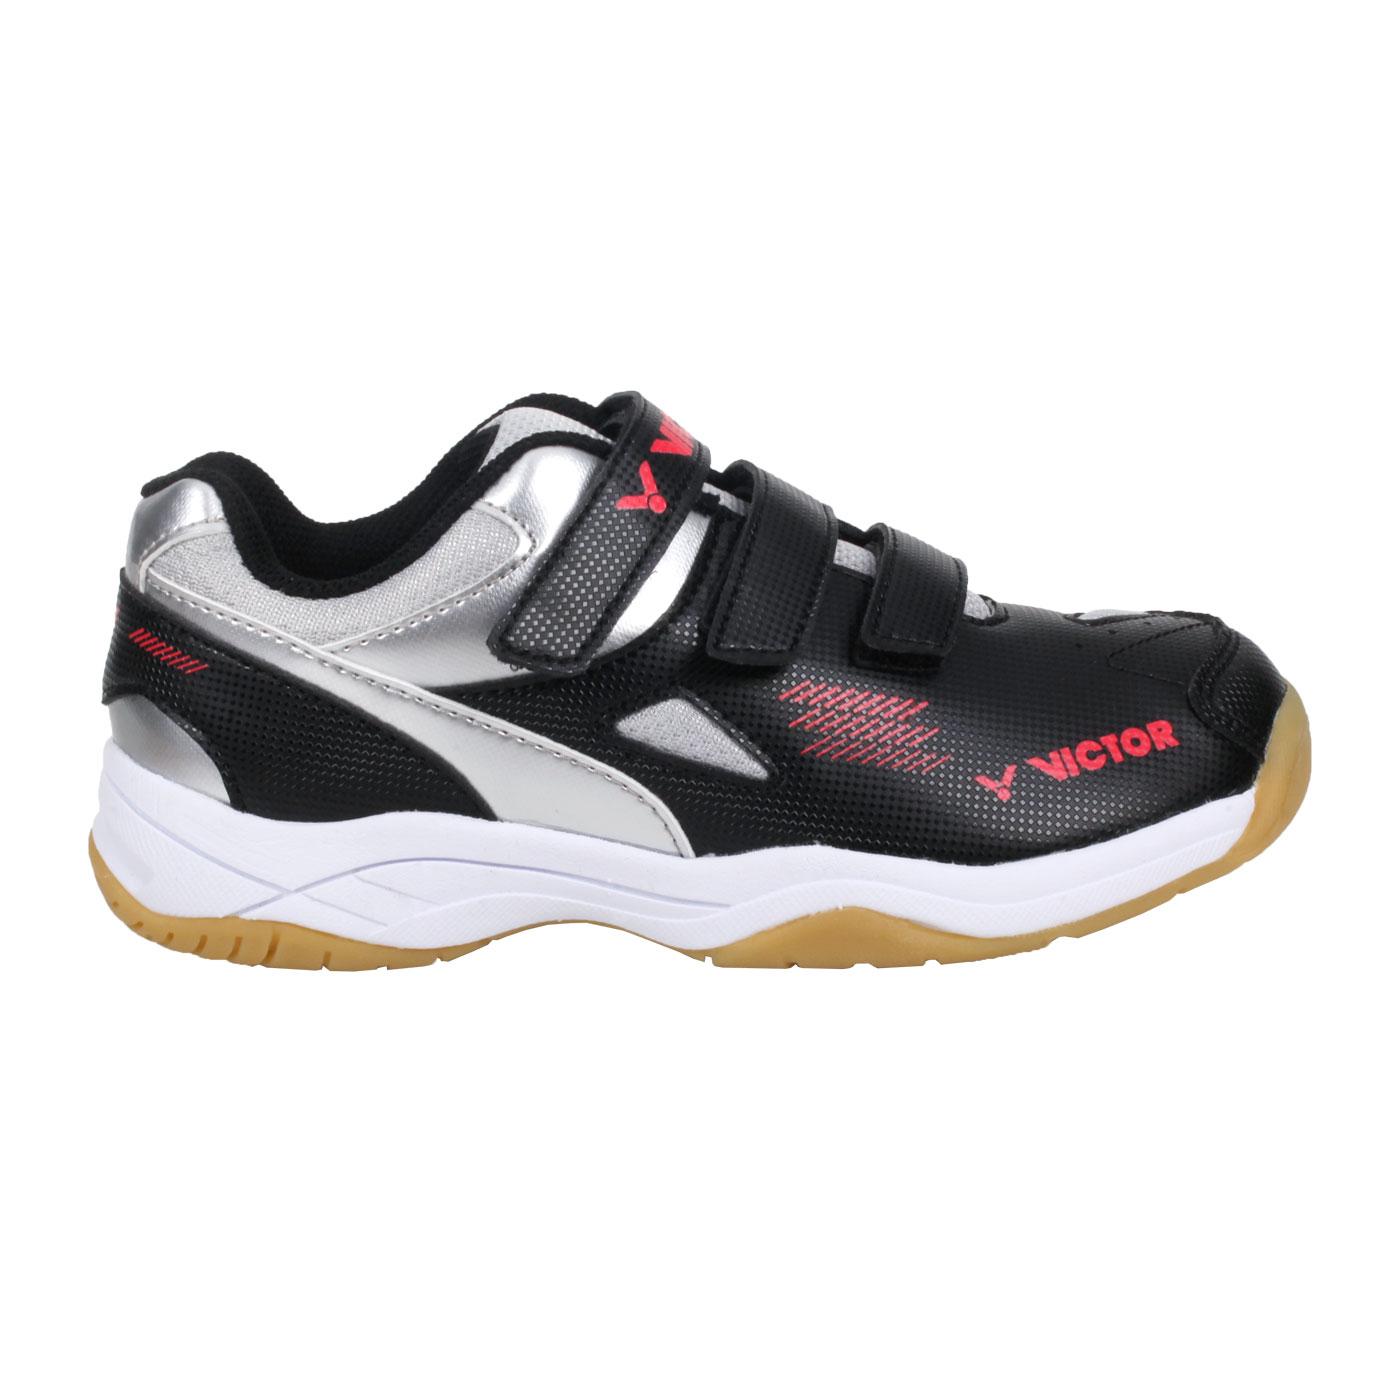 VICTOR 中童羽球鞋 A171JR-CS